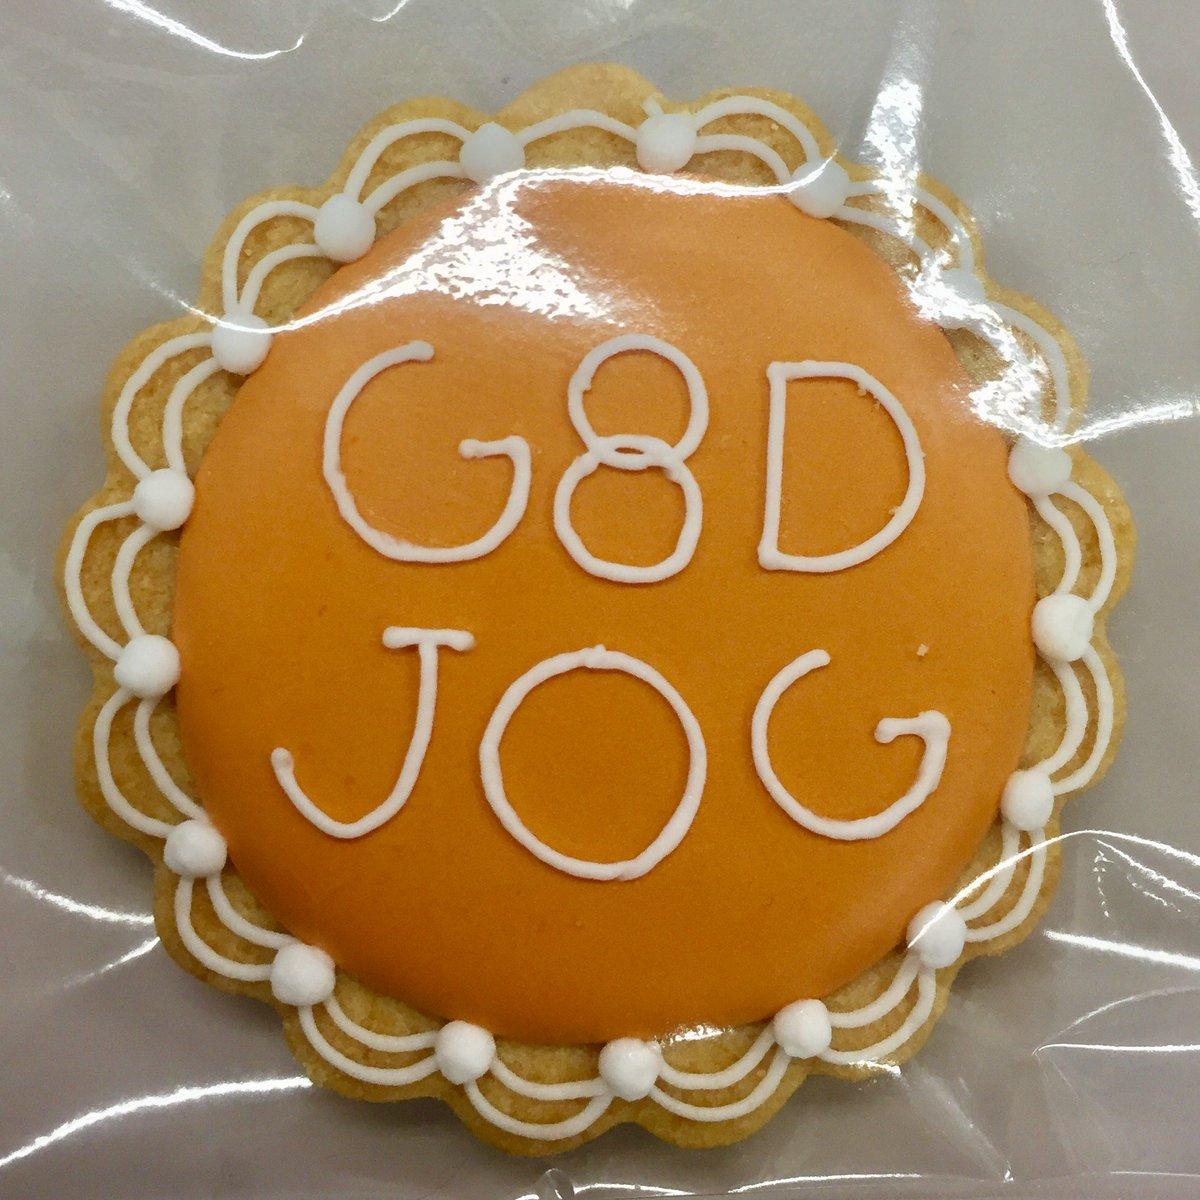 GOOD JOGのクッキーを手に入れたつぼ〜🙌🍀  #広島FM #今日のおやつ https://t.co/CHxNdaqR8N